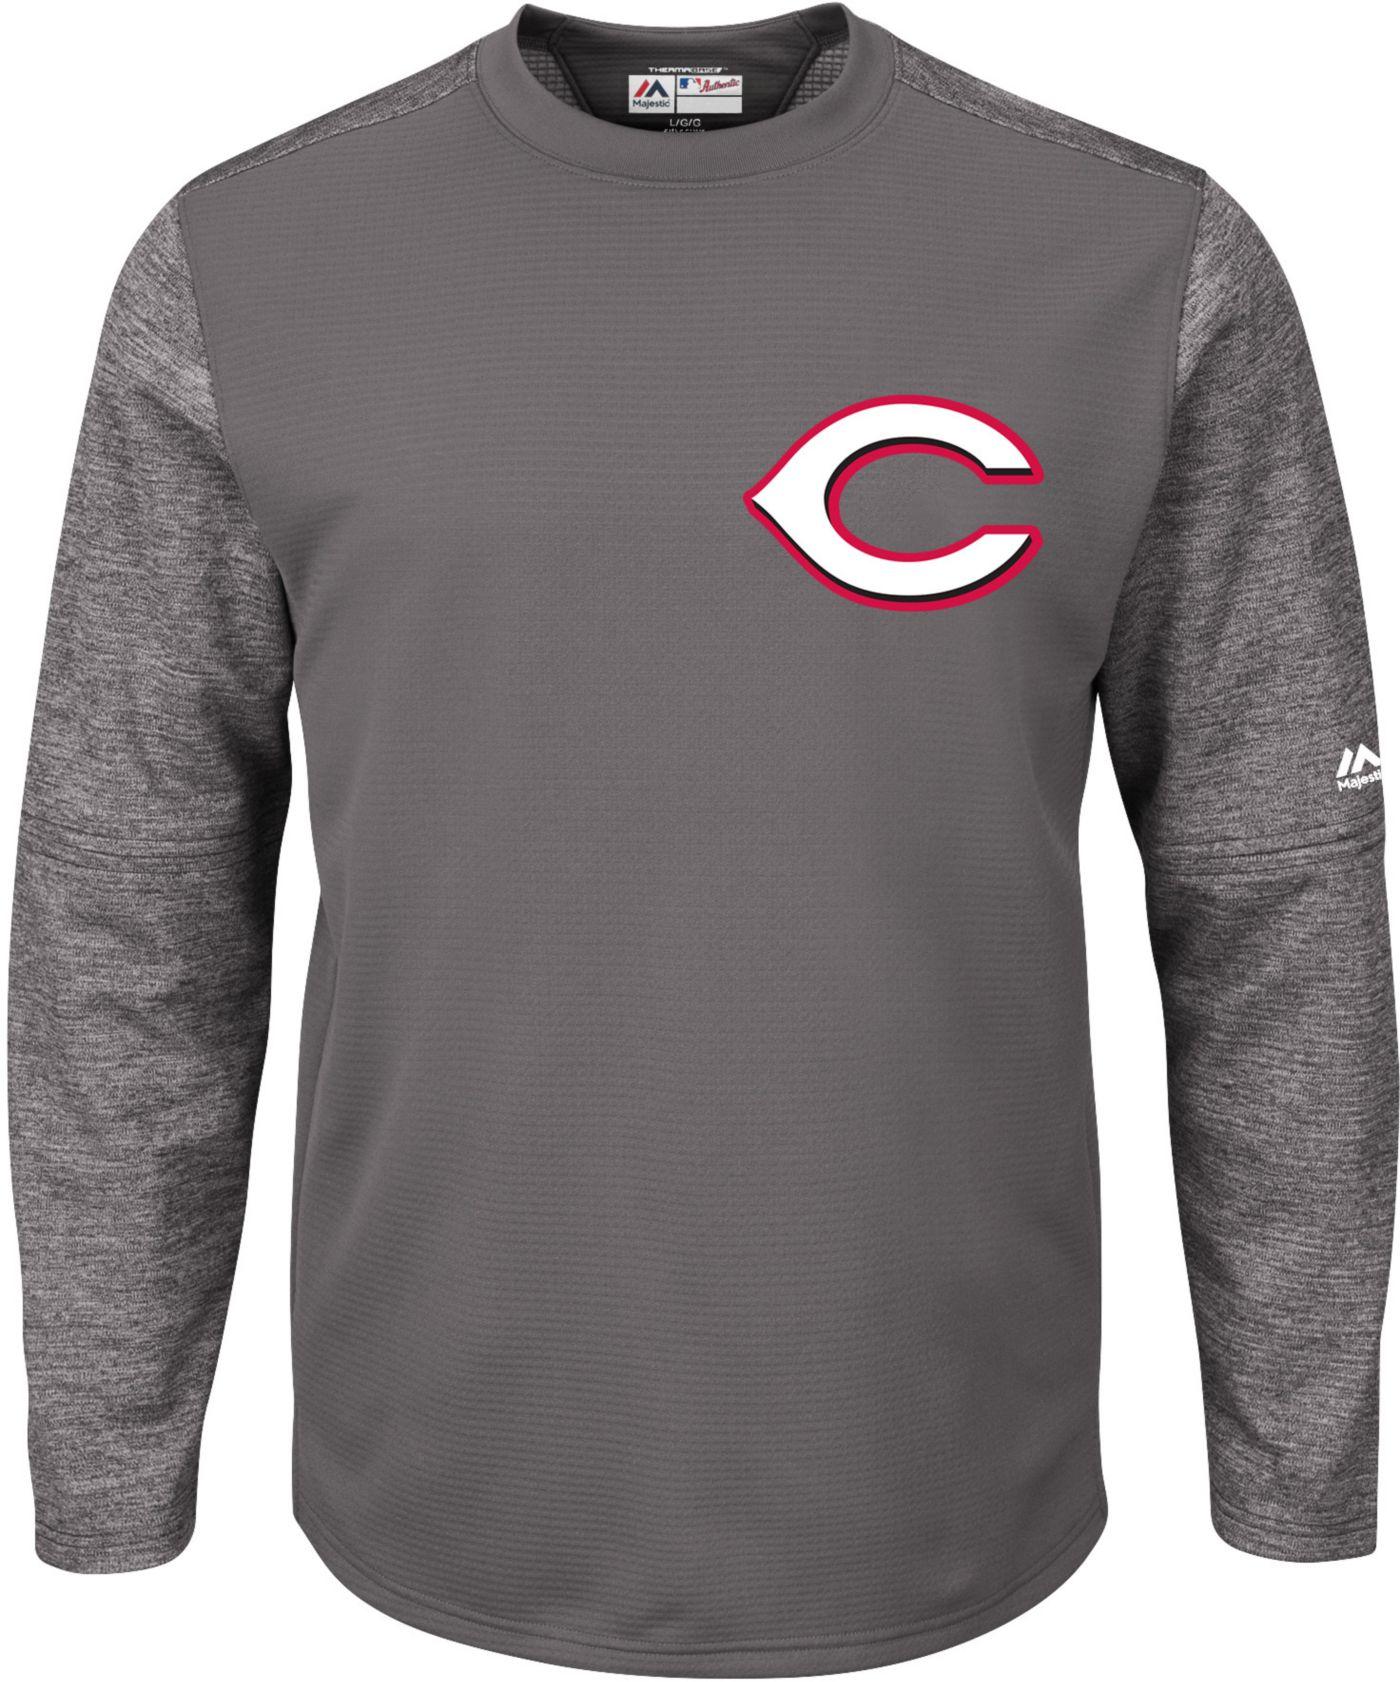 Majestic Men's Cincinnati Reds Therma Base Authentic Collection Pullover Tech Fleece